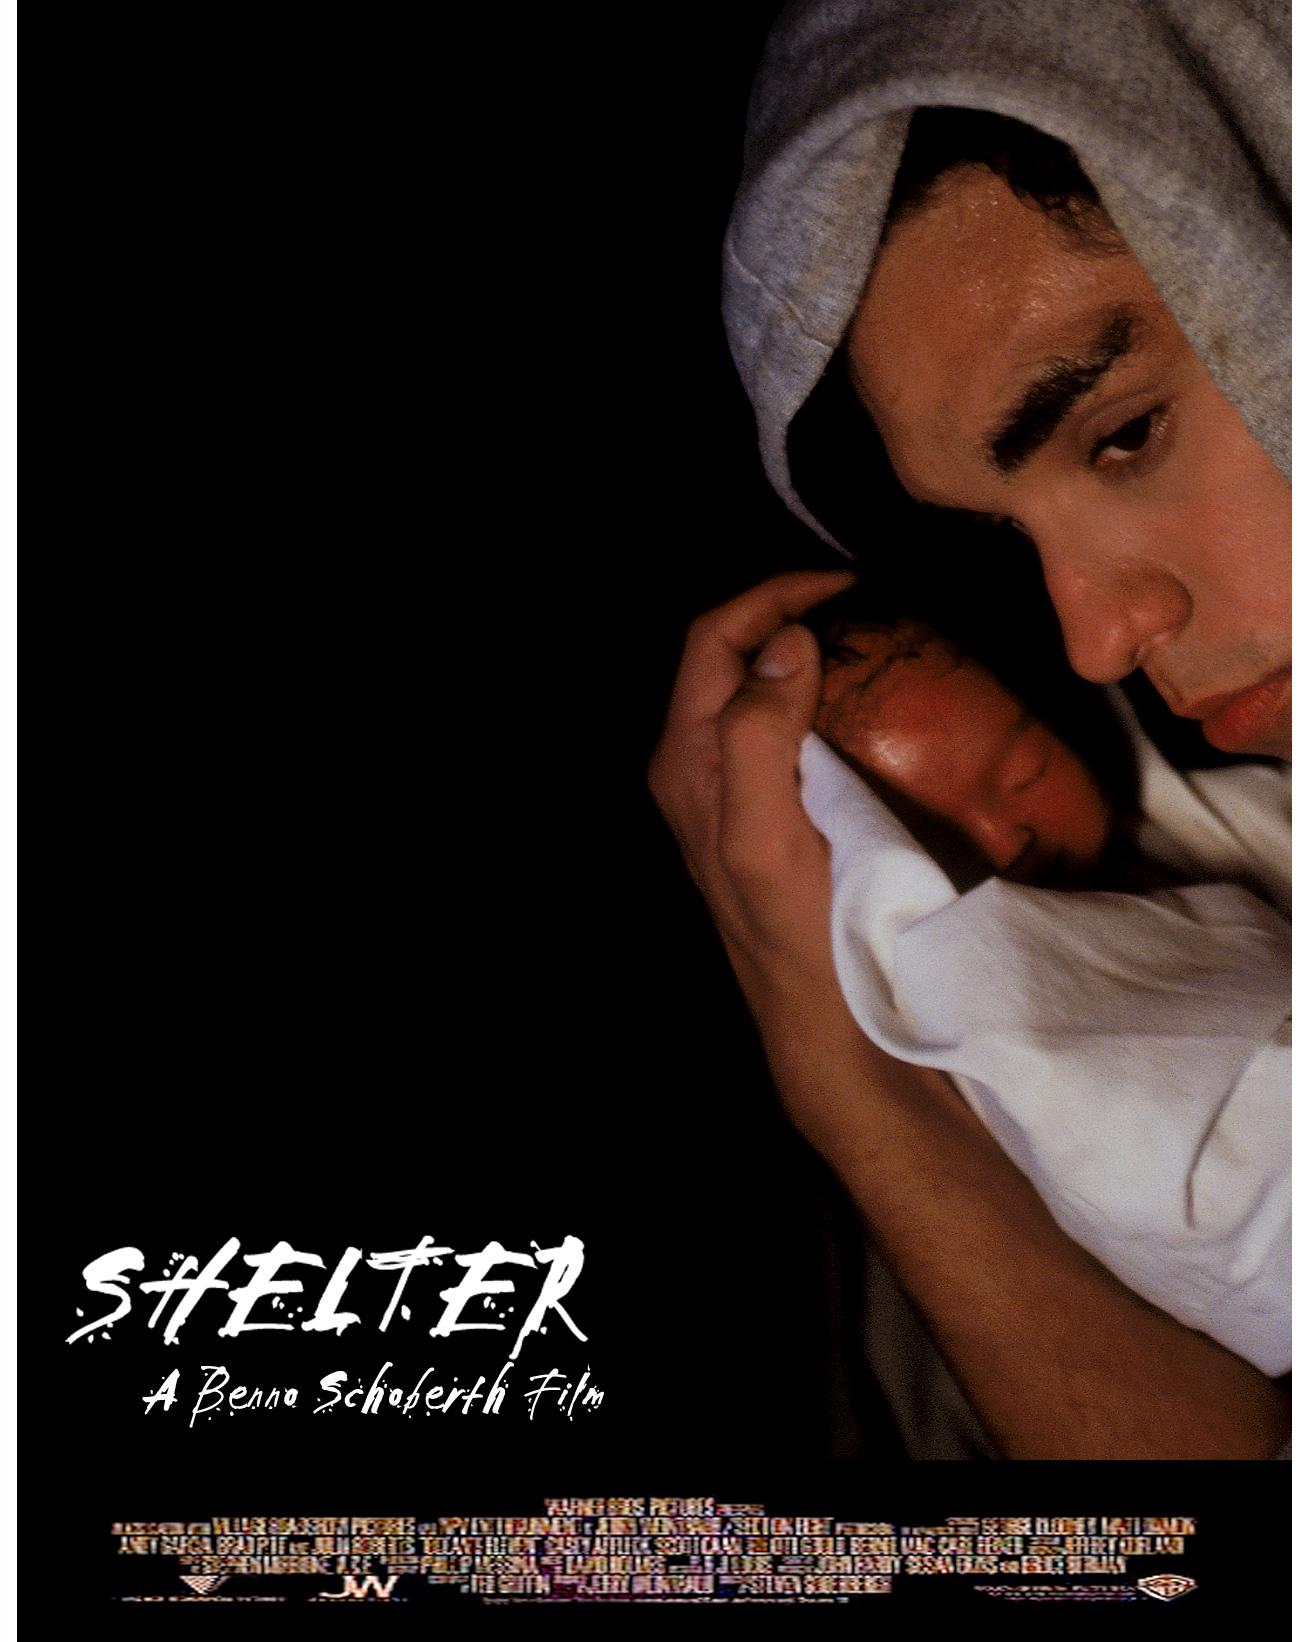 shelterposter03.jpg